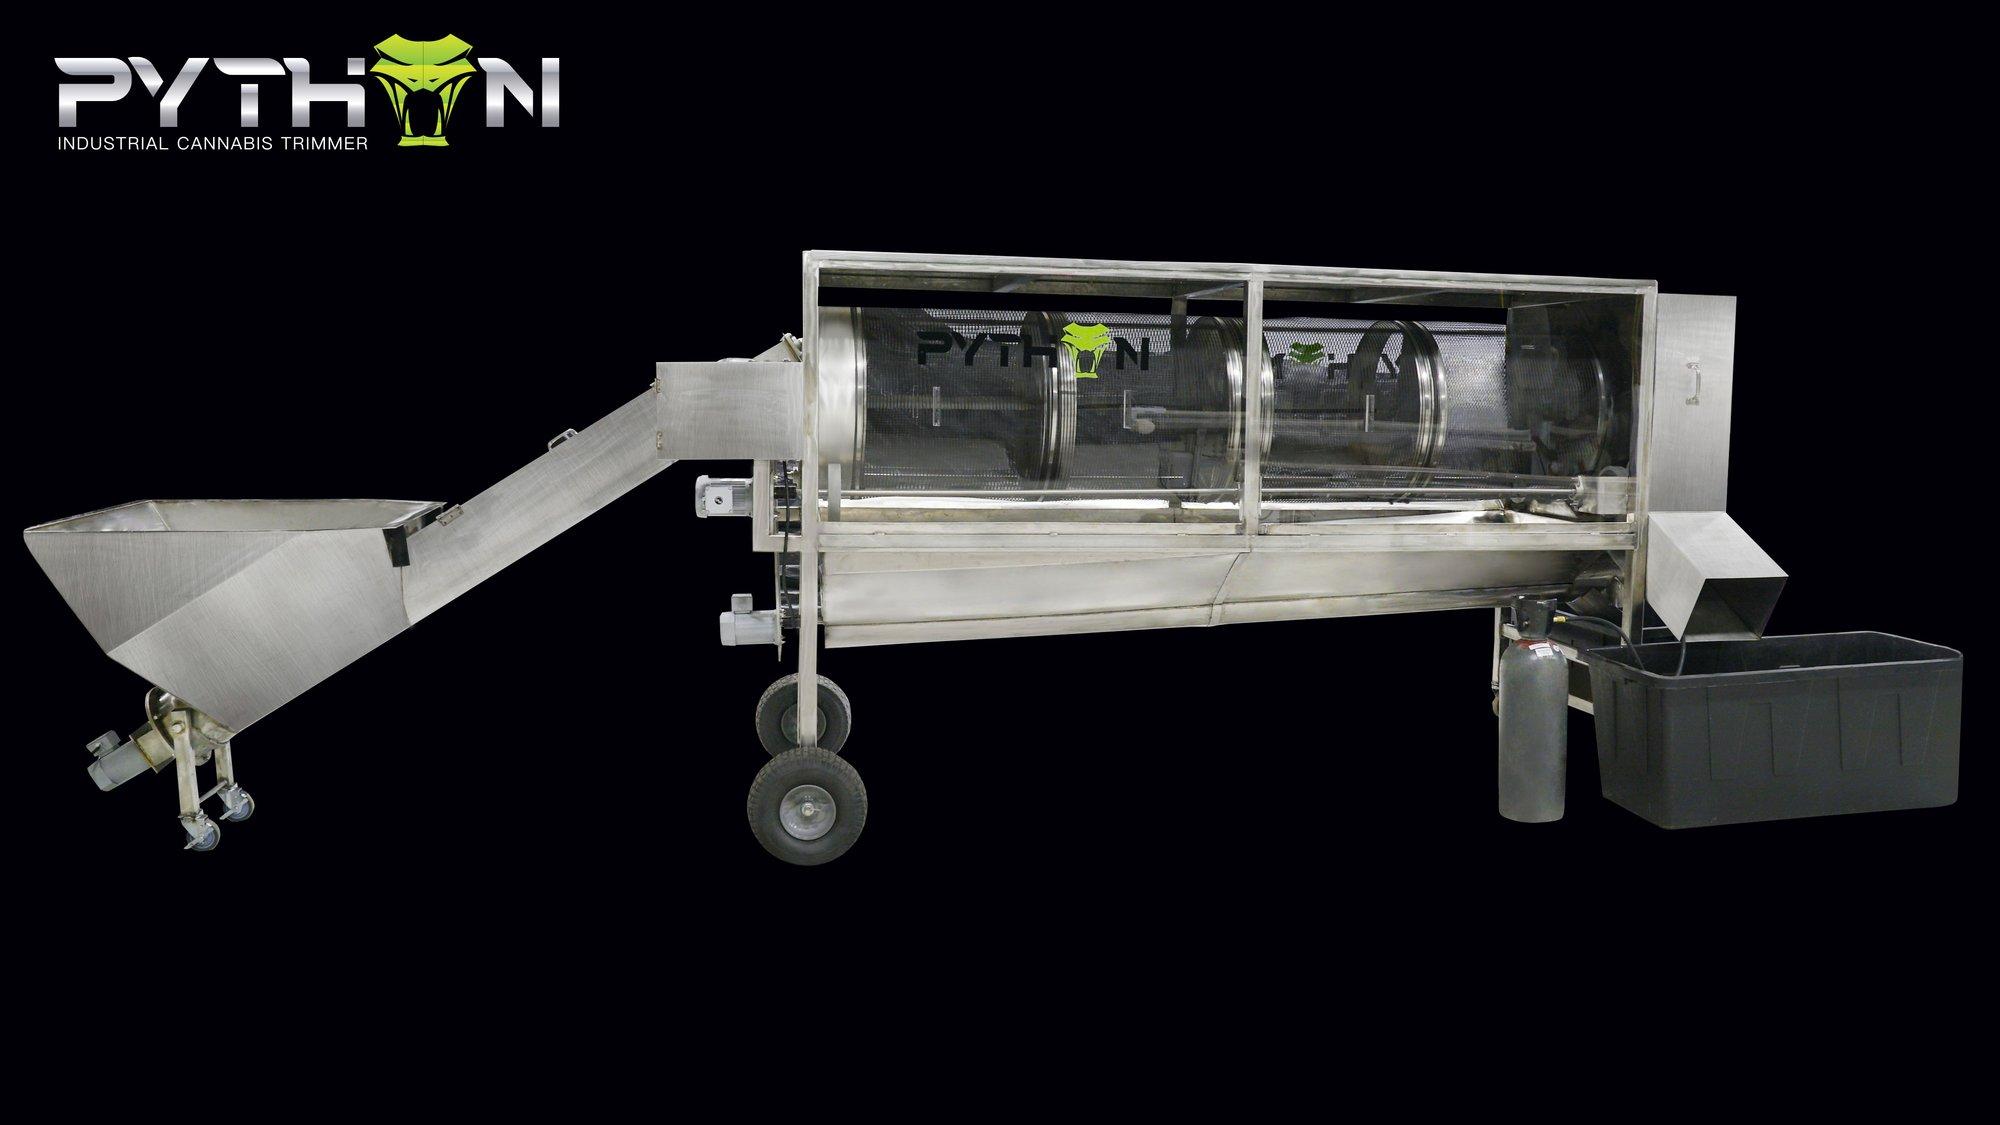 Python Hemp and Cannabis Trim Machine